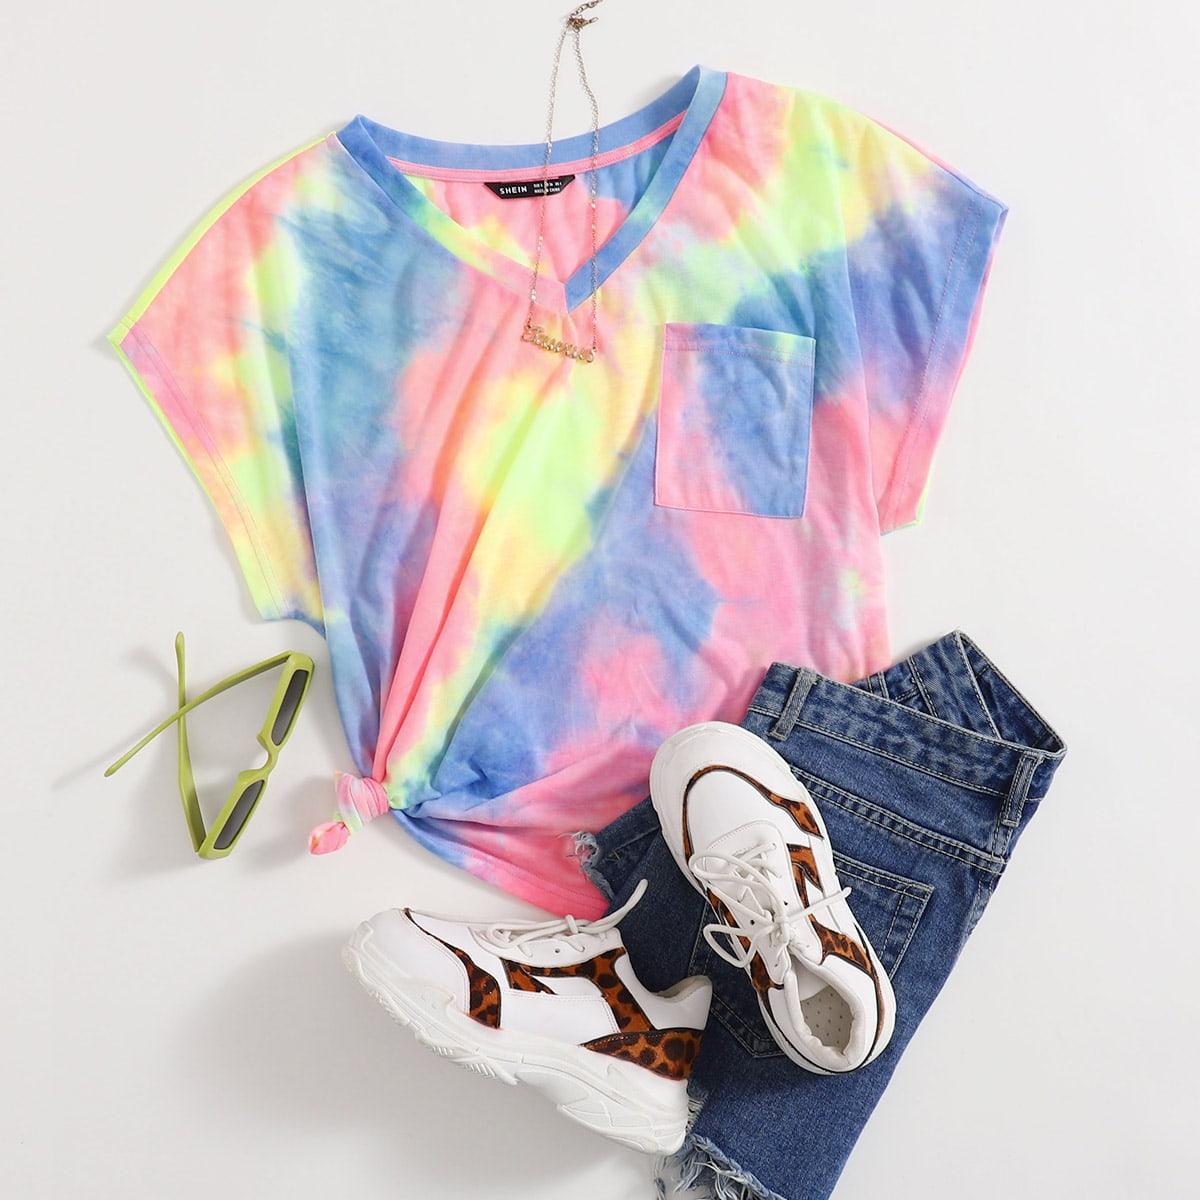 Casual Tie dye T-shirt Zak